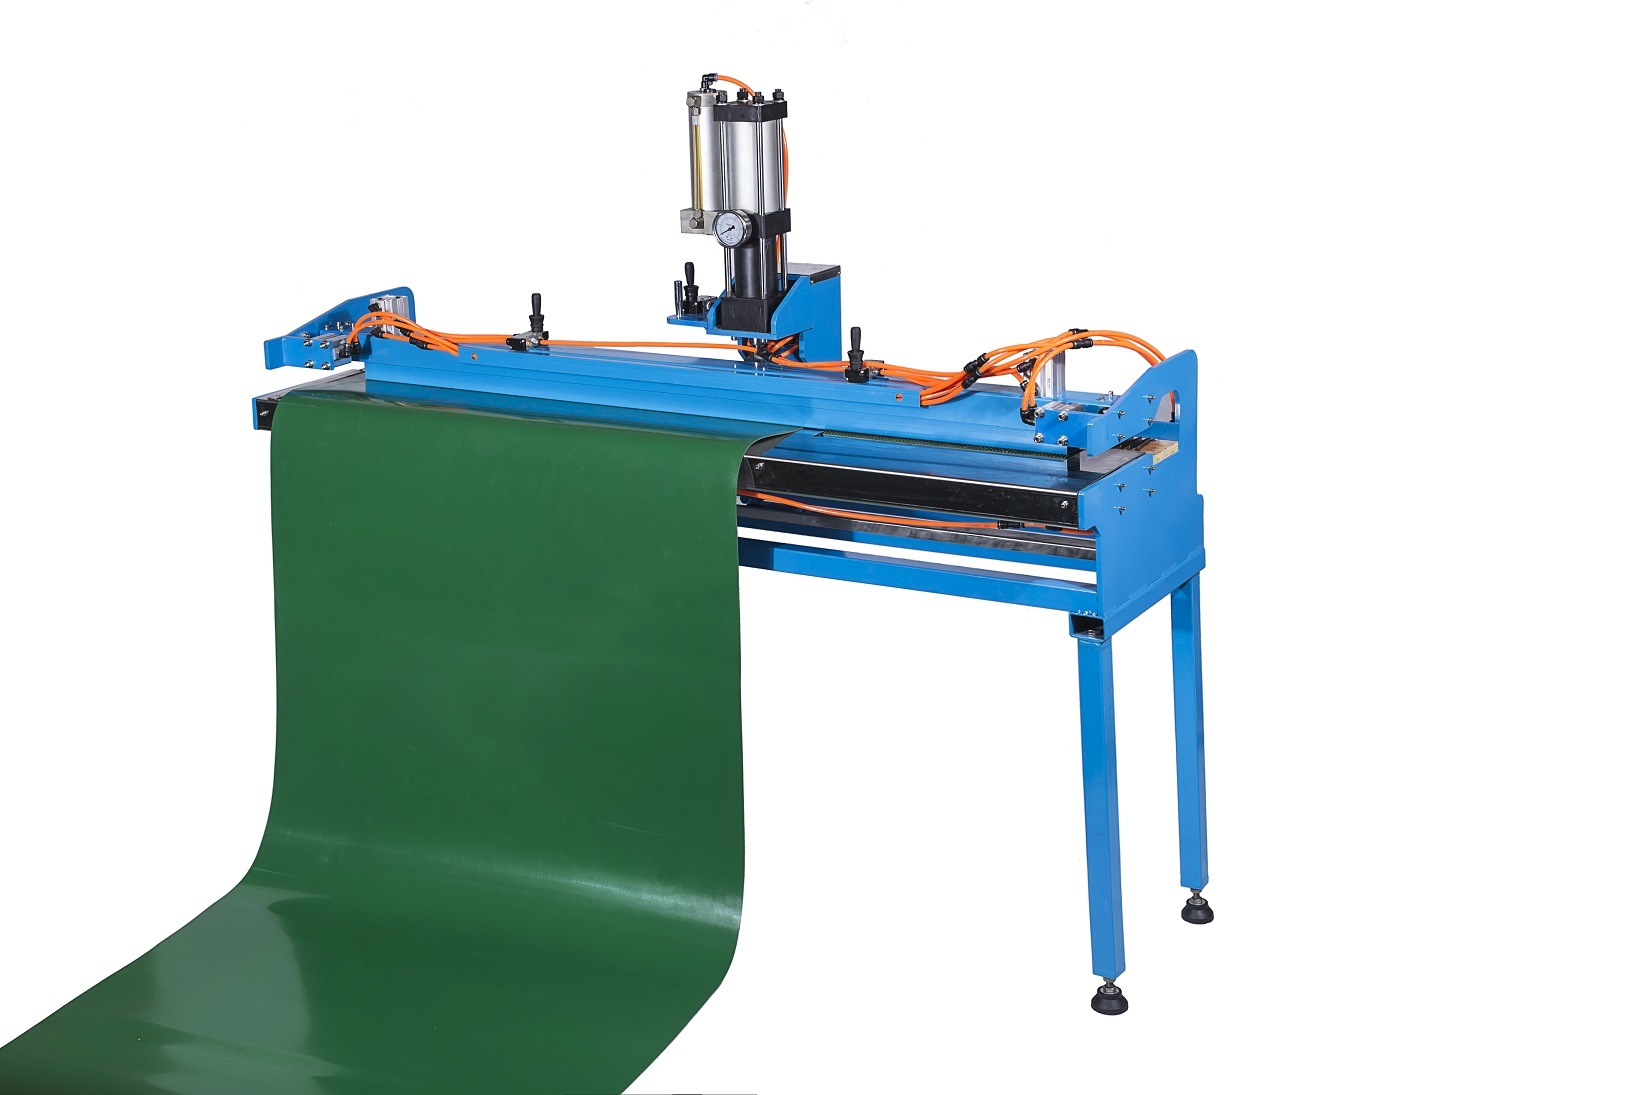 Finger Puncher for PVC Conveyor Belts, Light Weight Belt